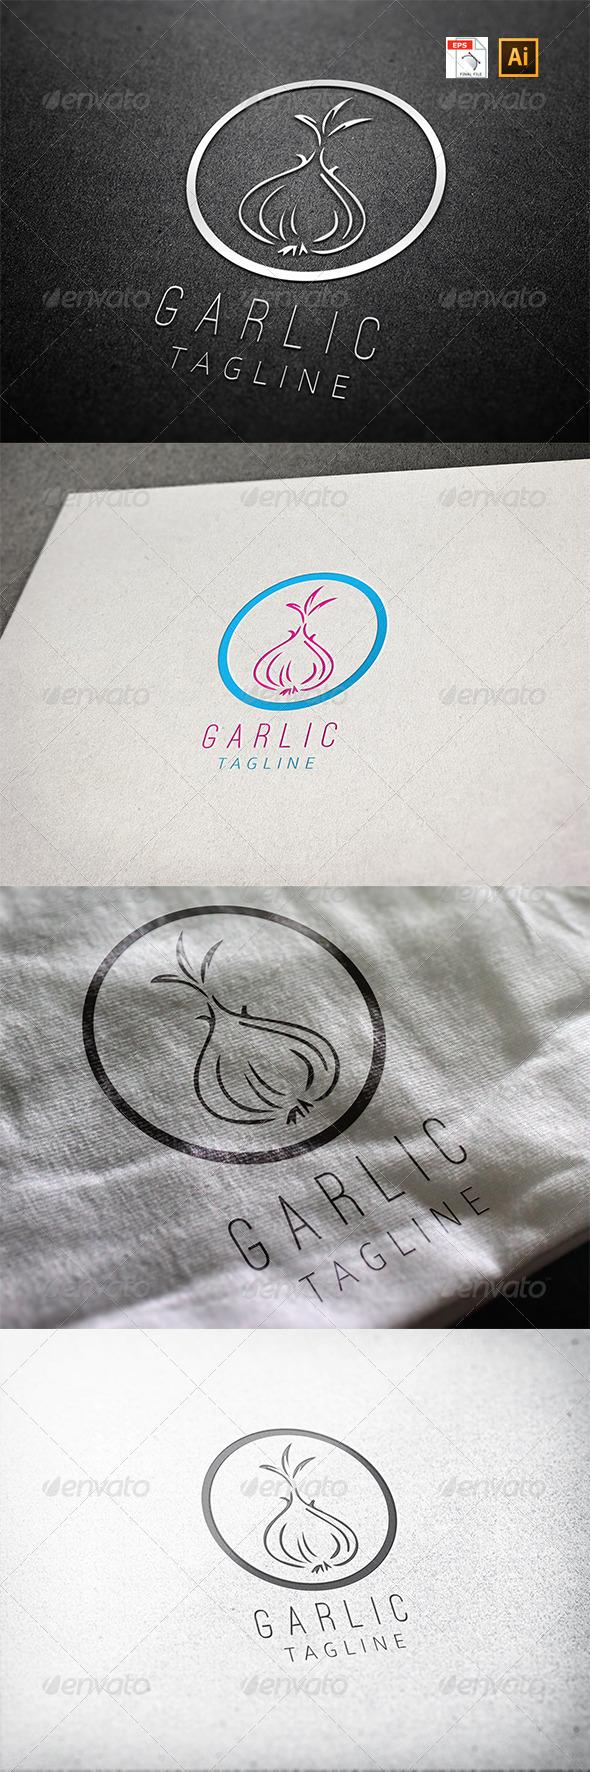 GraphicRiver Garlic Logo 8125317